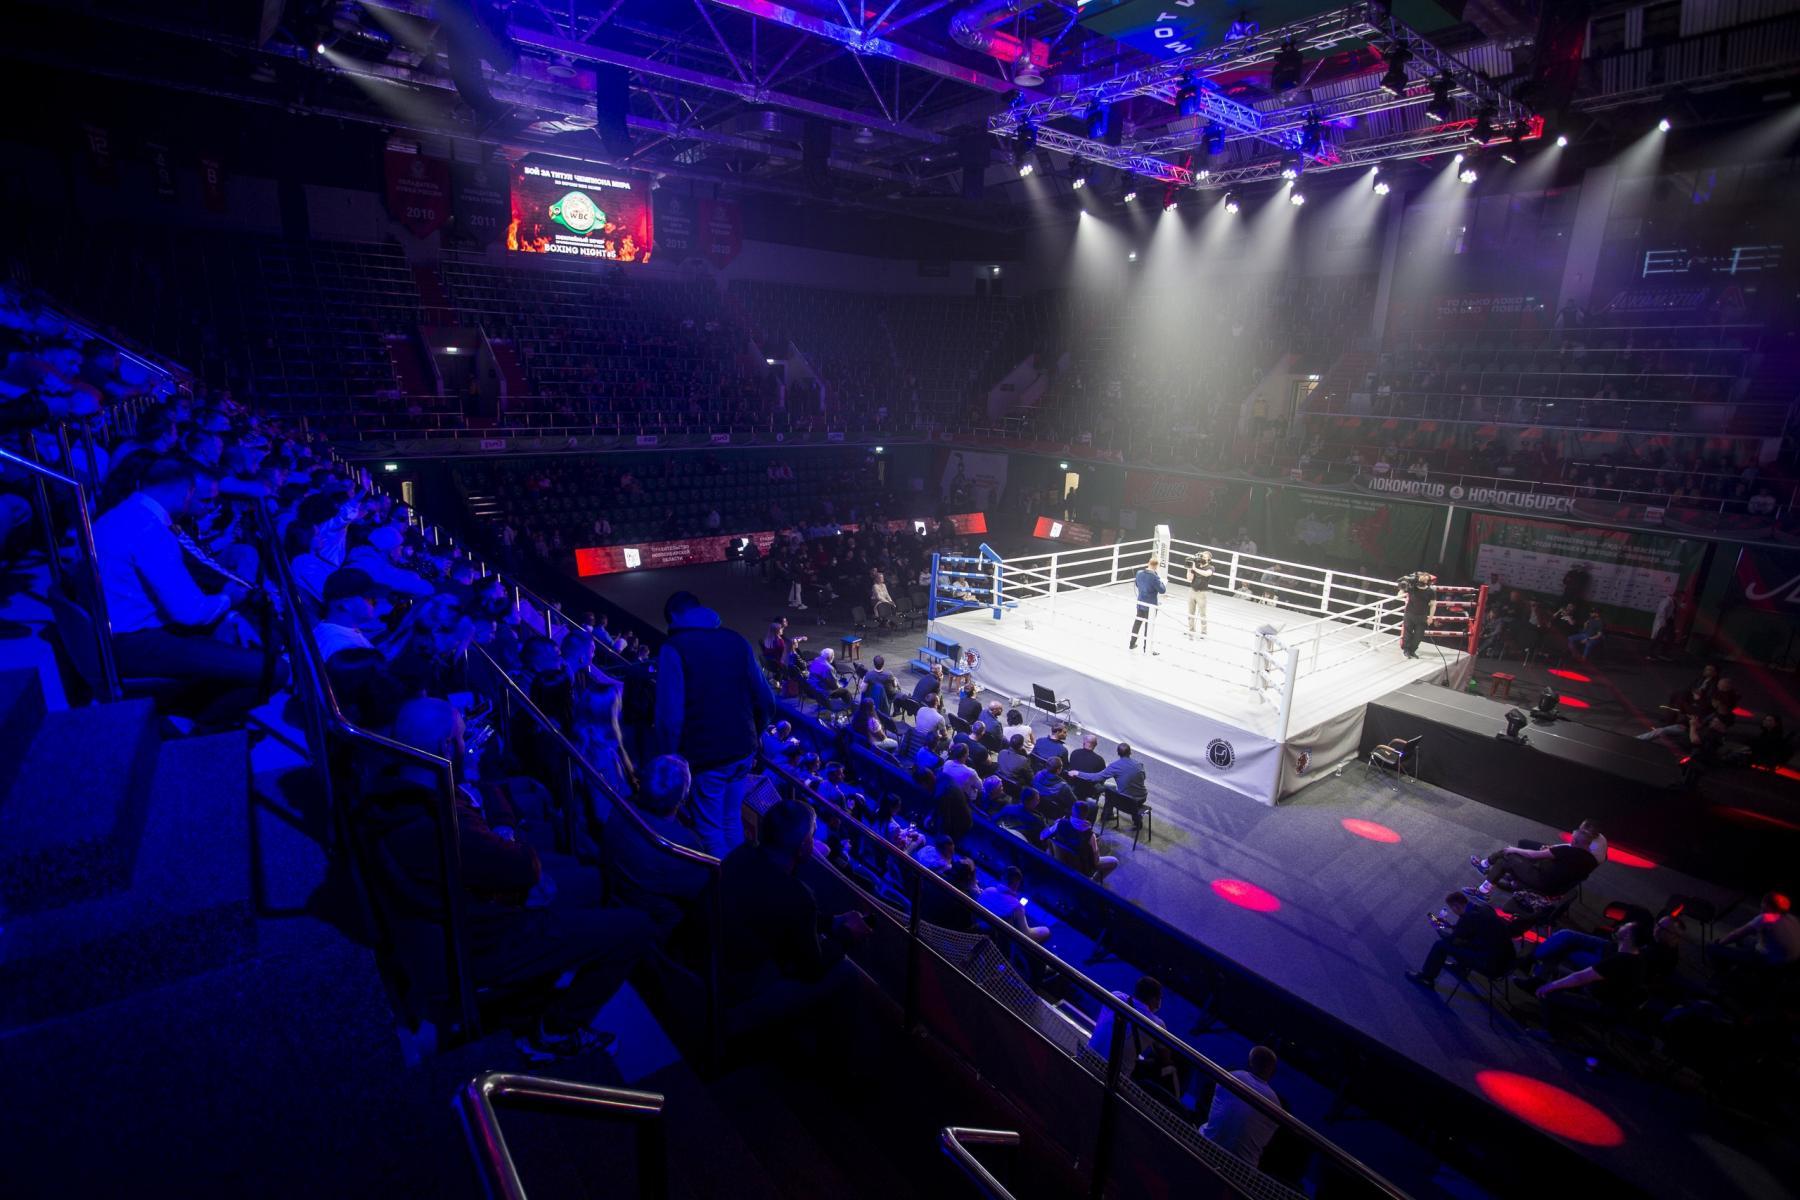 фото Боксёр из Новосибирска Павел Силягин стал азиатско-тихоокеанским чемпионом WBO 2